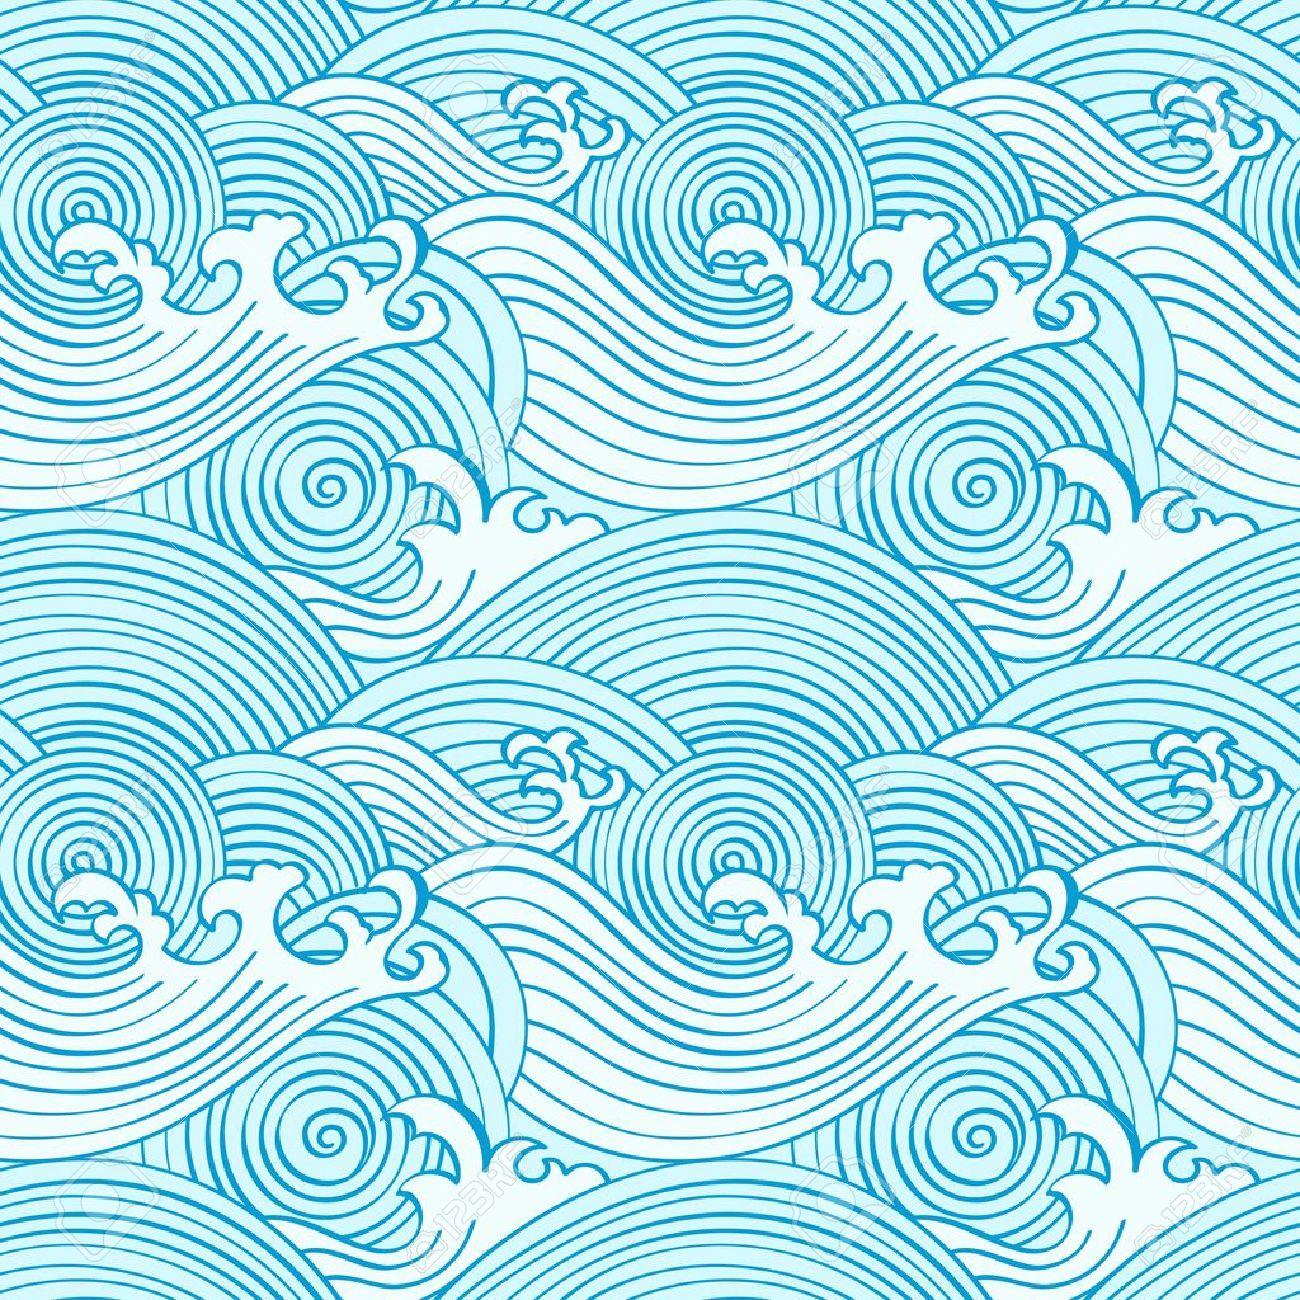 Japanese seamless waves pattern in ocean colors Stock Vector - 9447976